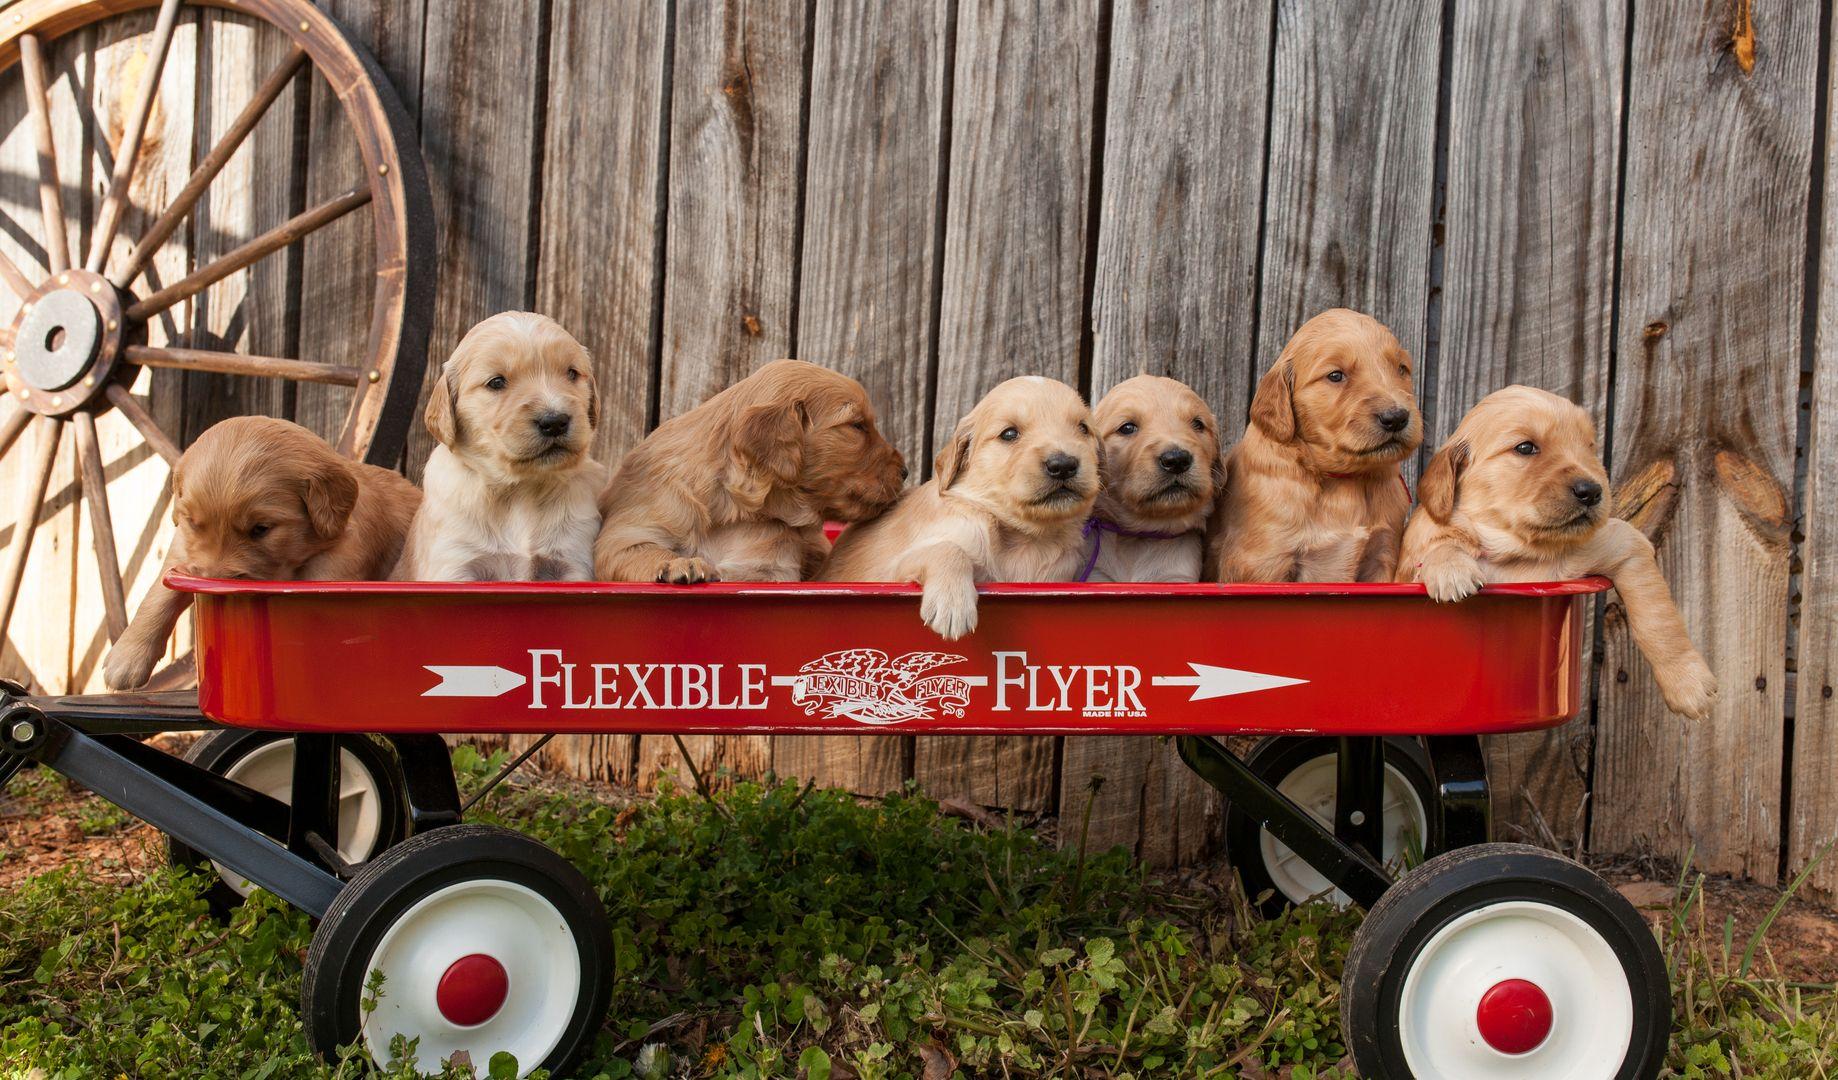 Golden Retriever Puppies For Sale English Cream Retriever Puppies Roland S Retriever S Navarre Fl Retriever Puppy Puppy Litter Golden Retriever Breeder